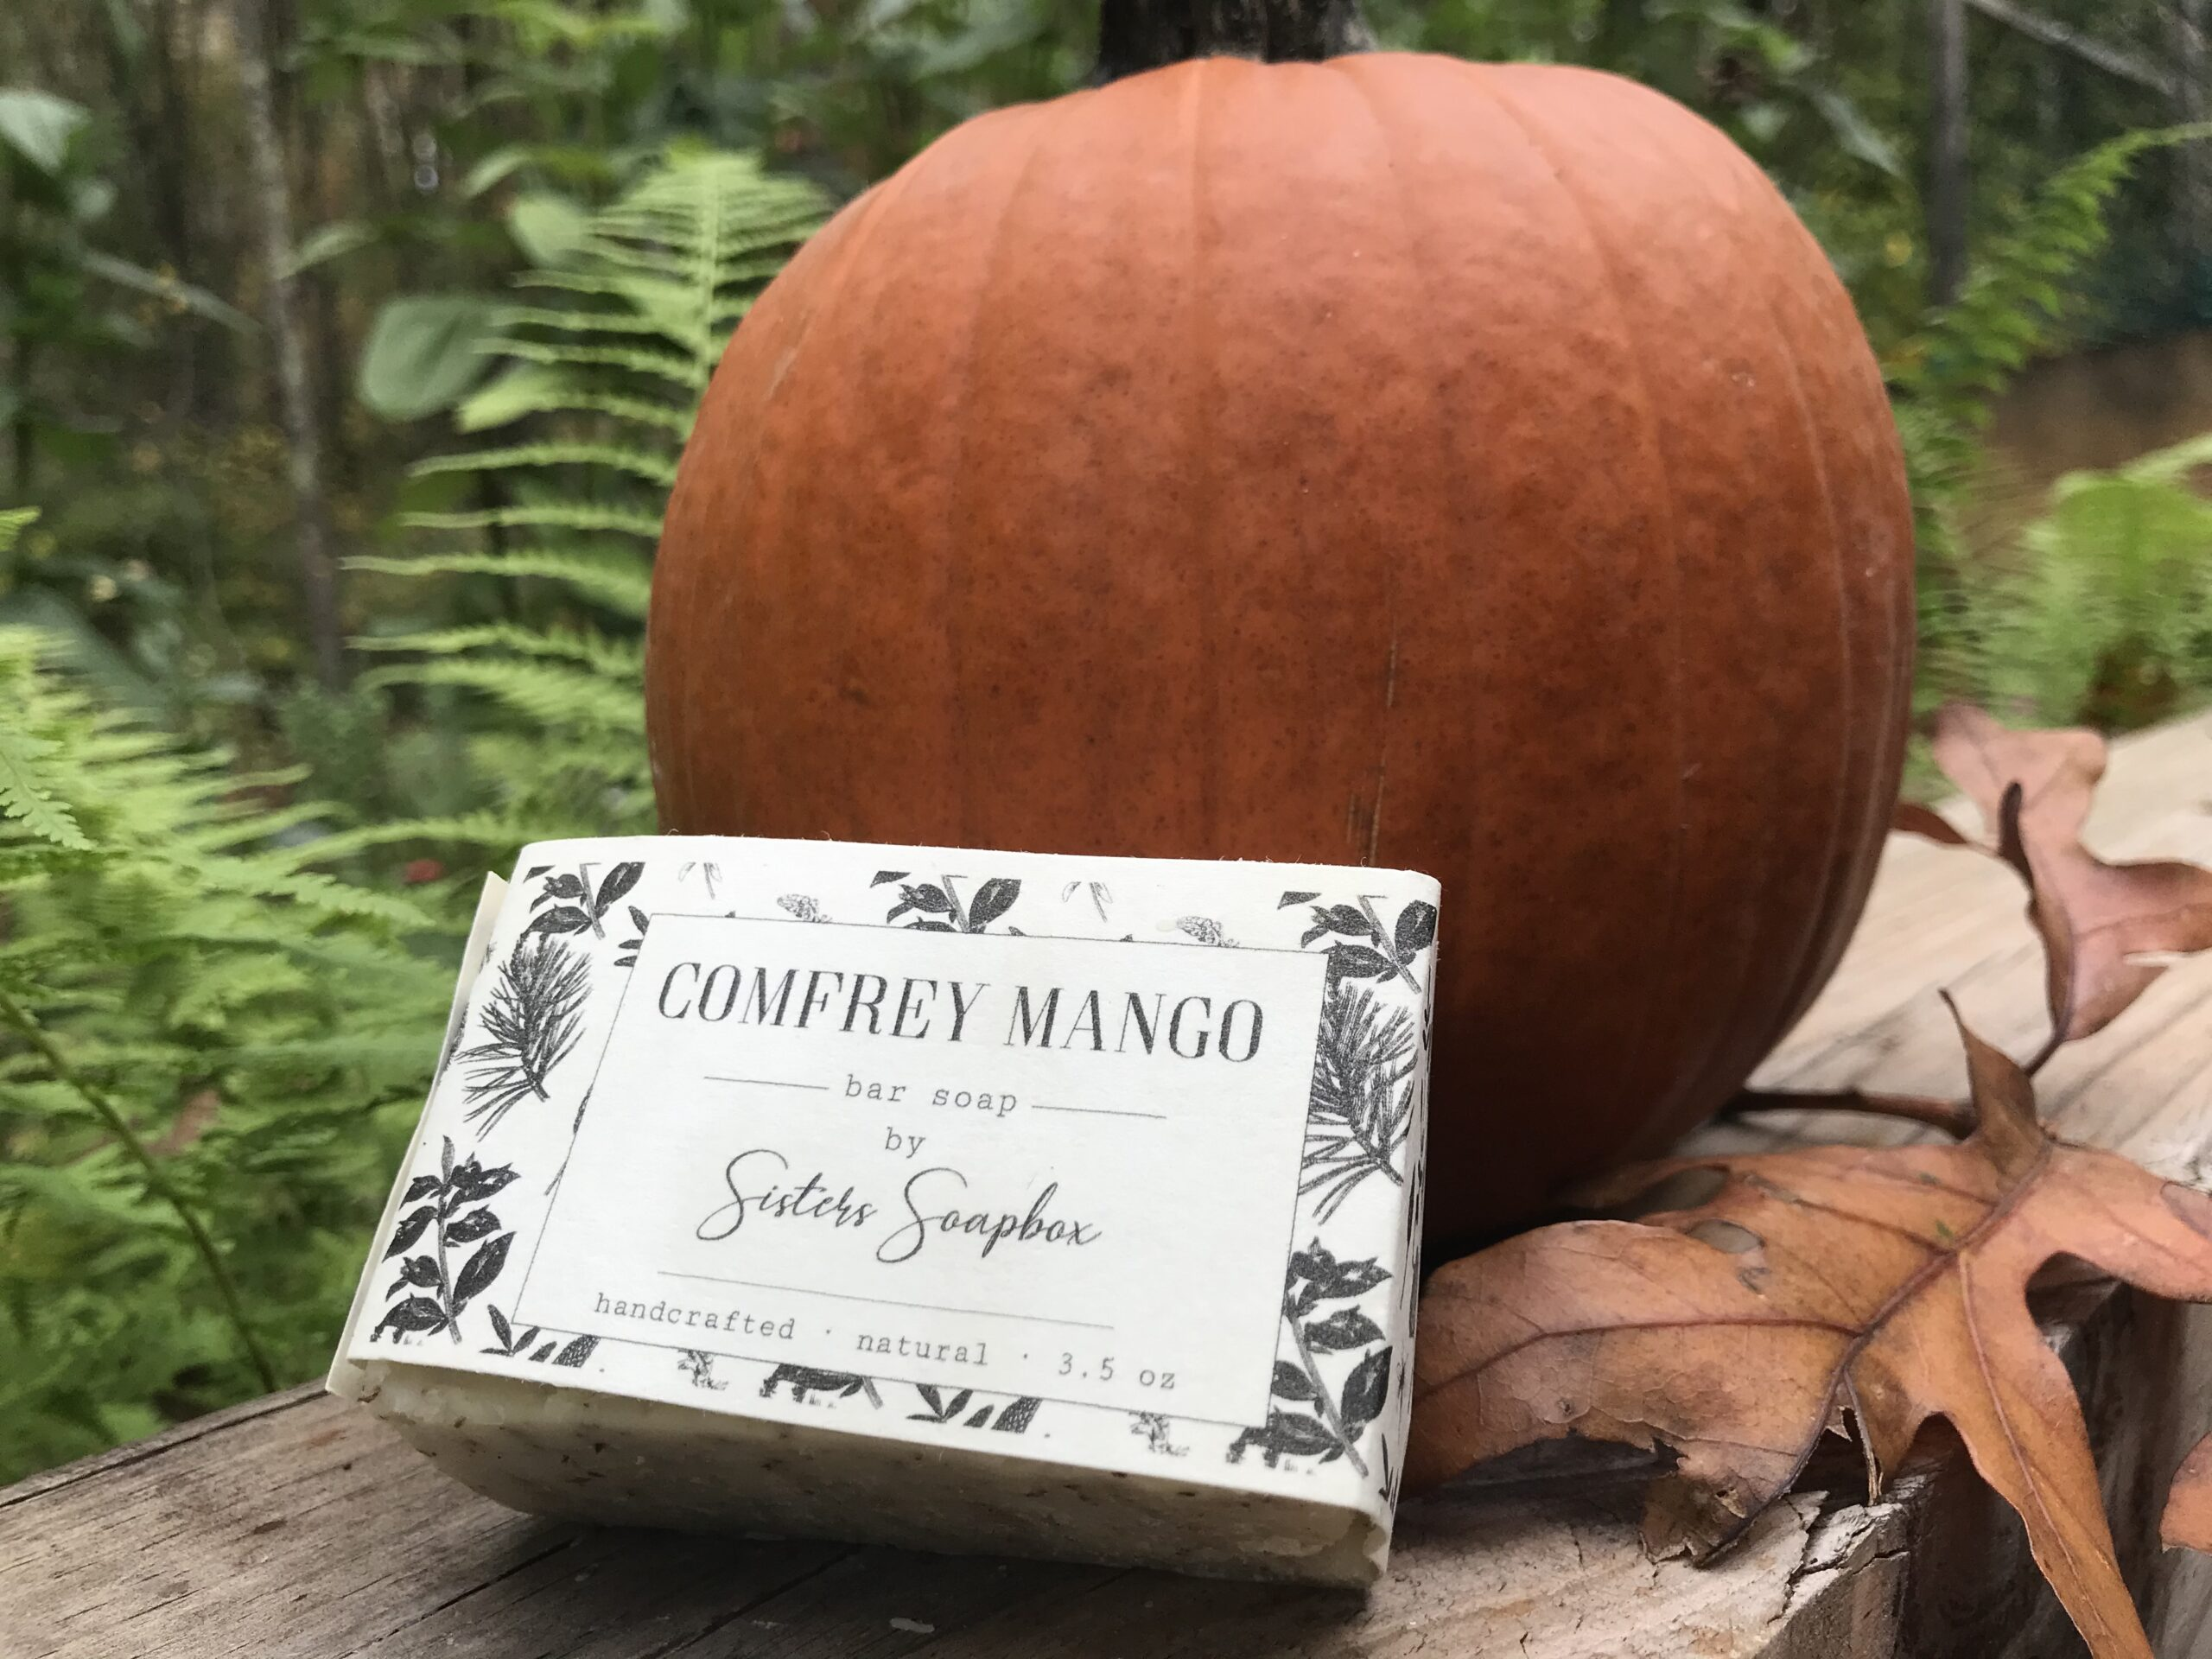 Comfrey Mango bar soap leaning against a pumpkin